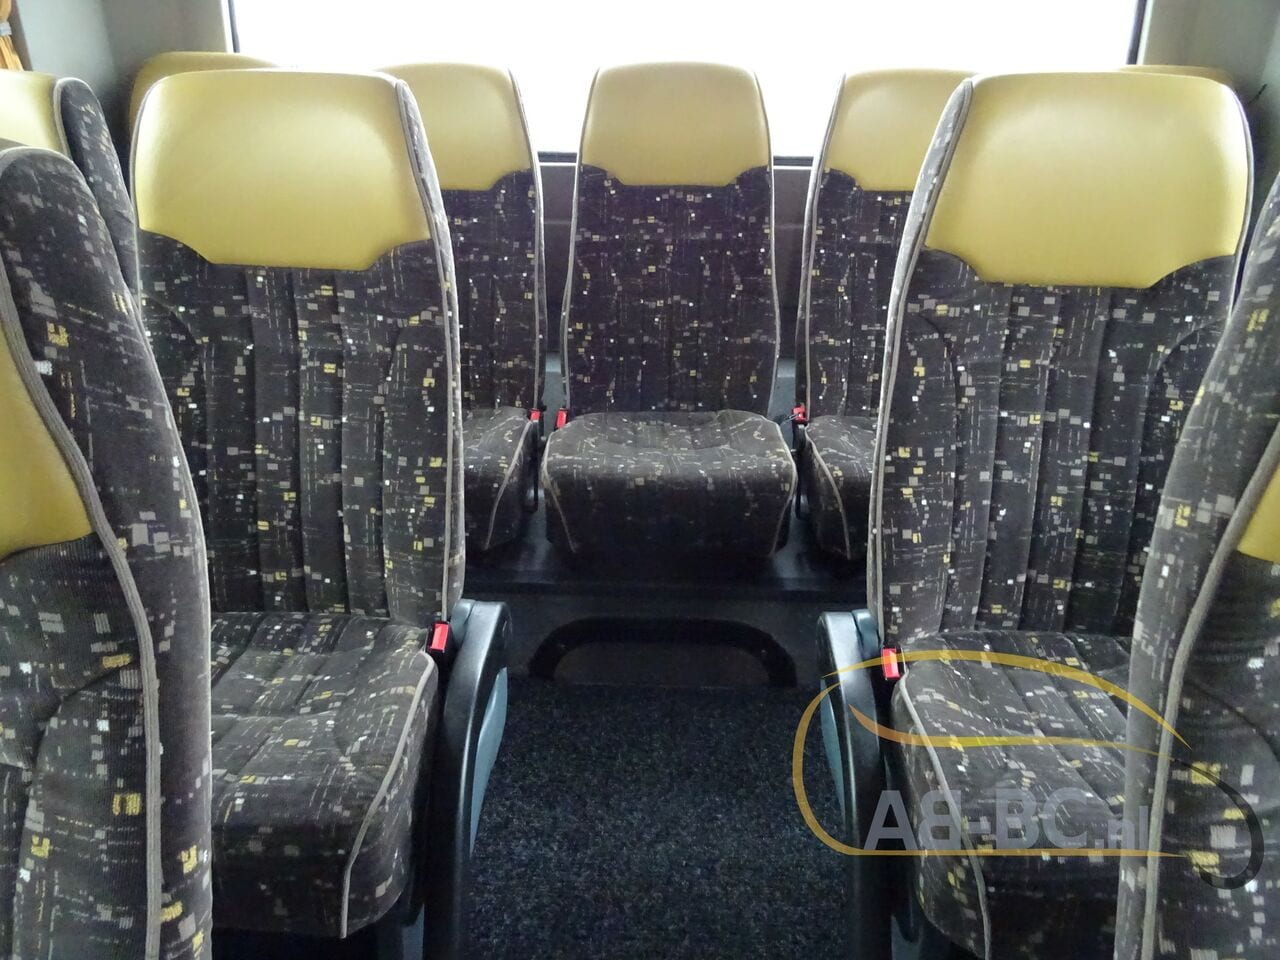 coach-busTEMSA-Safari-HD-51-Seats-EURO5-12-MTR---1614266654869721288_big_64a2b5e5afbaff7607899e9f5858572b--19052917224730818200